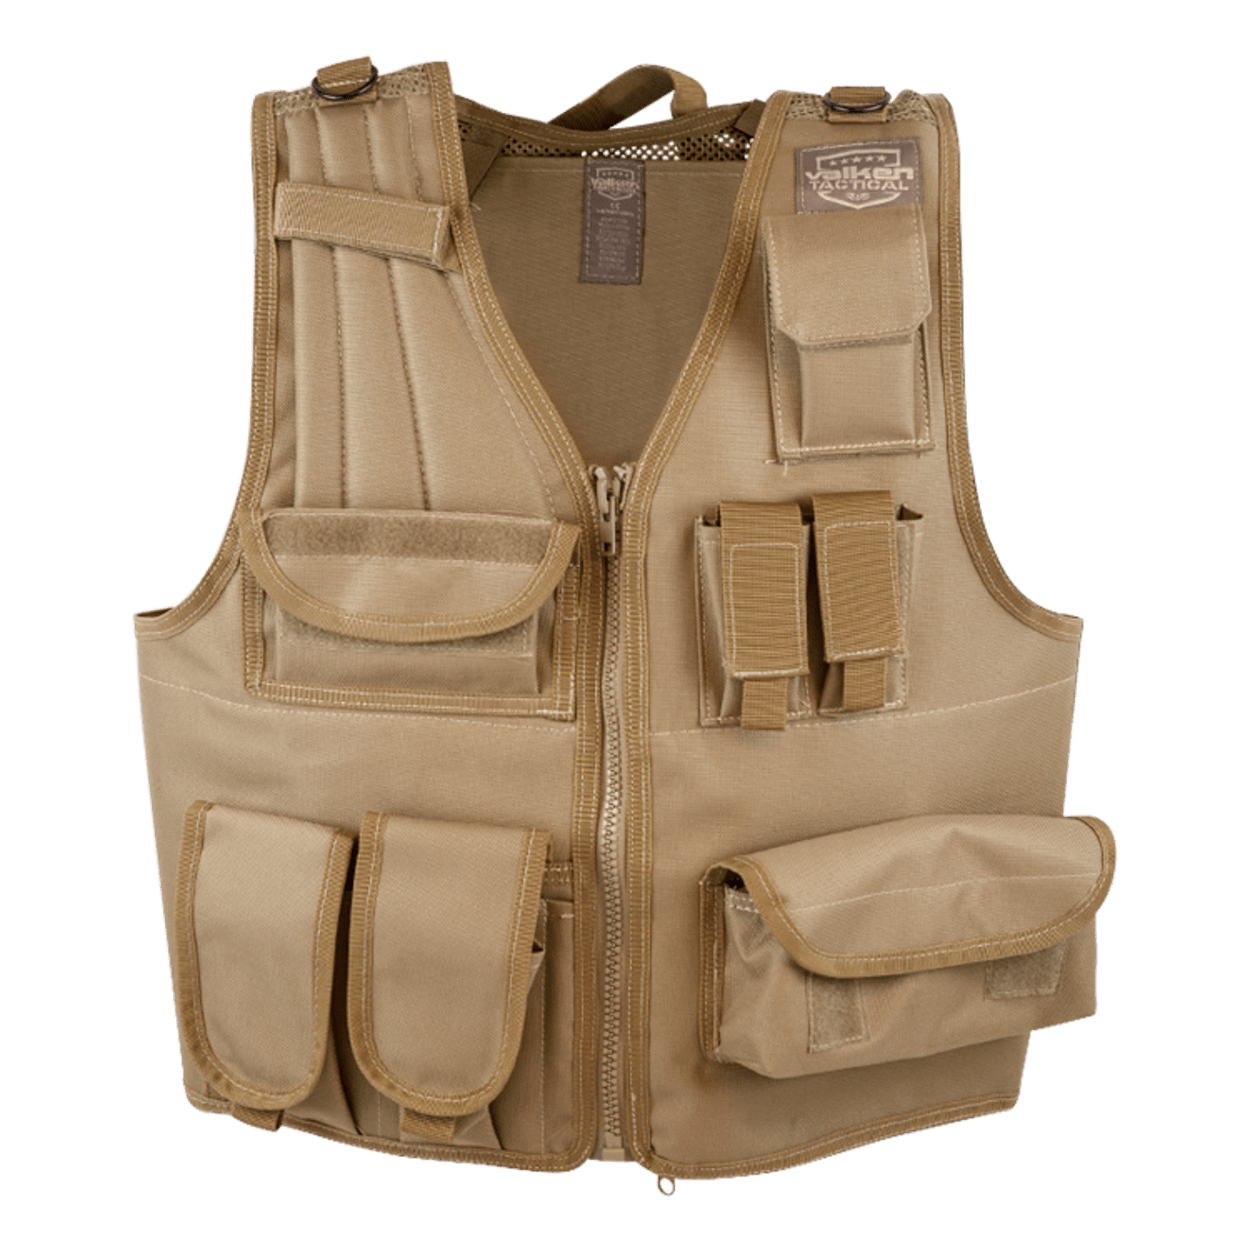 Valken Tactical Vest (Size Adjustable) – Tan product image